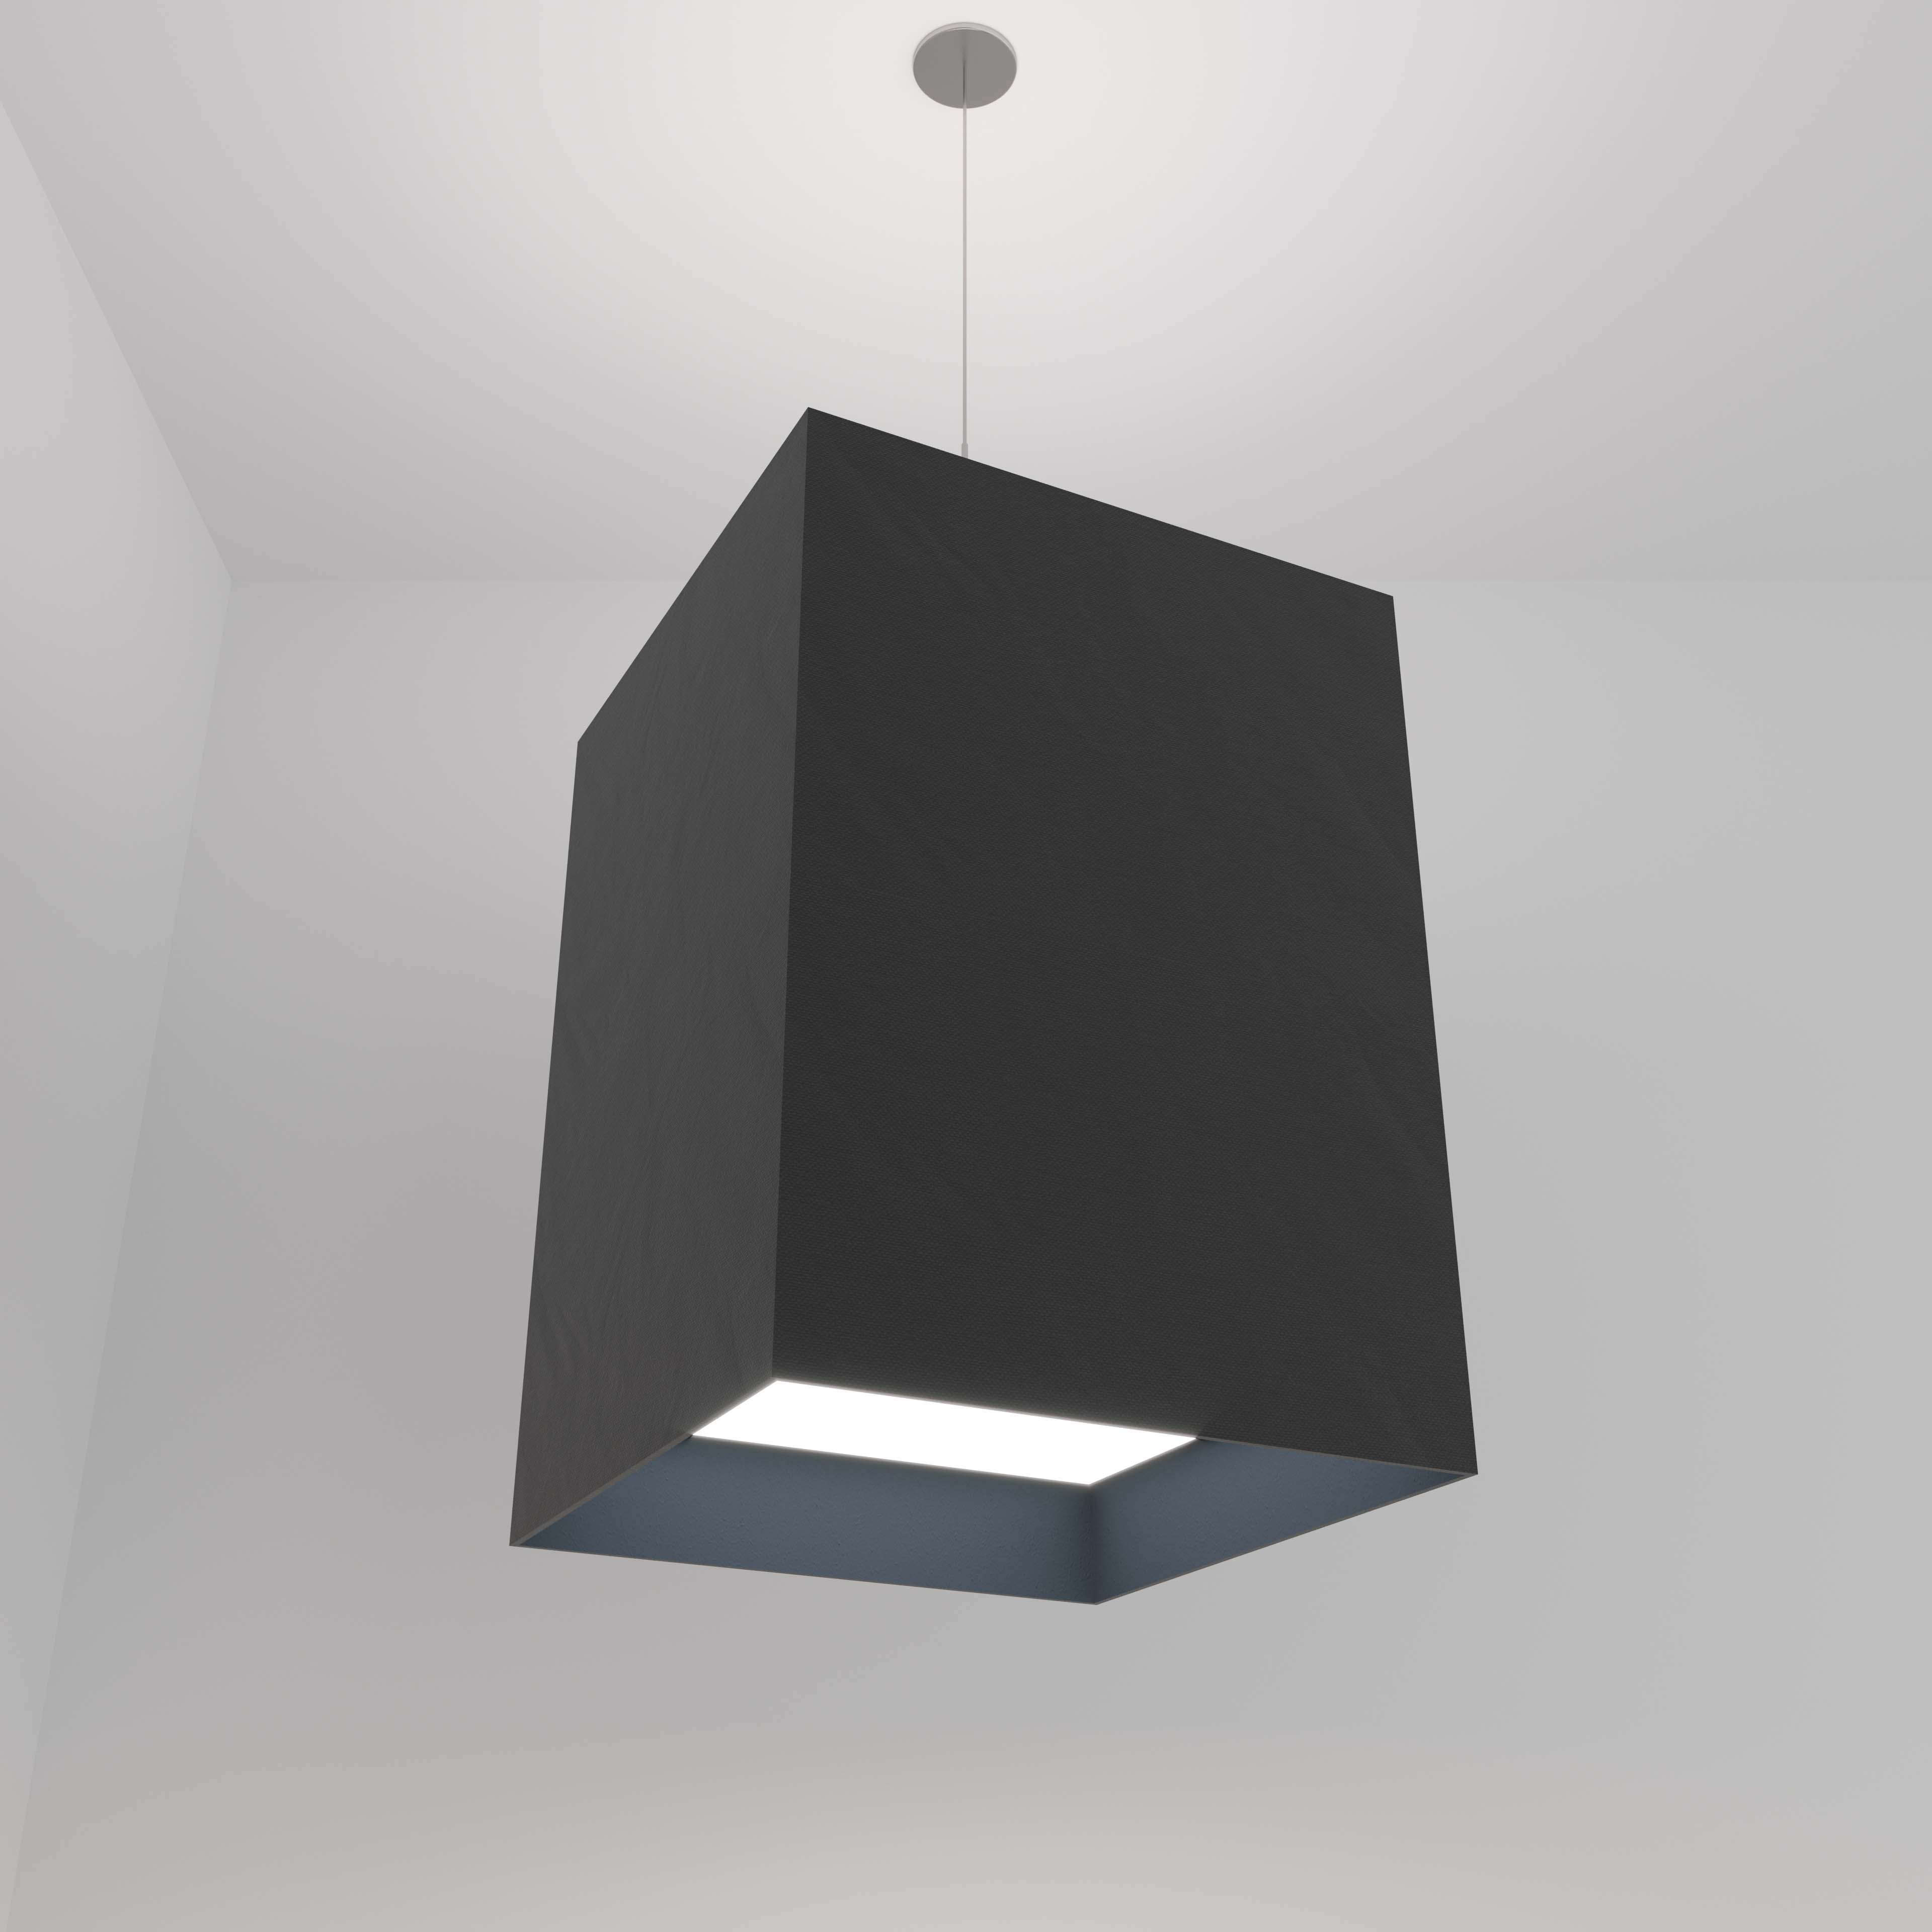 Visa Lighting acoustic felt commercial architectural lighting pendant square.